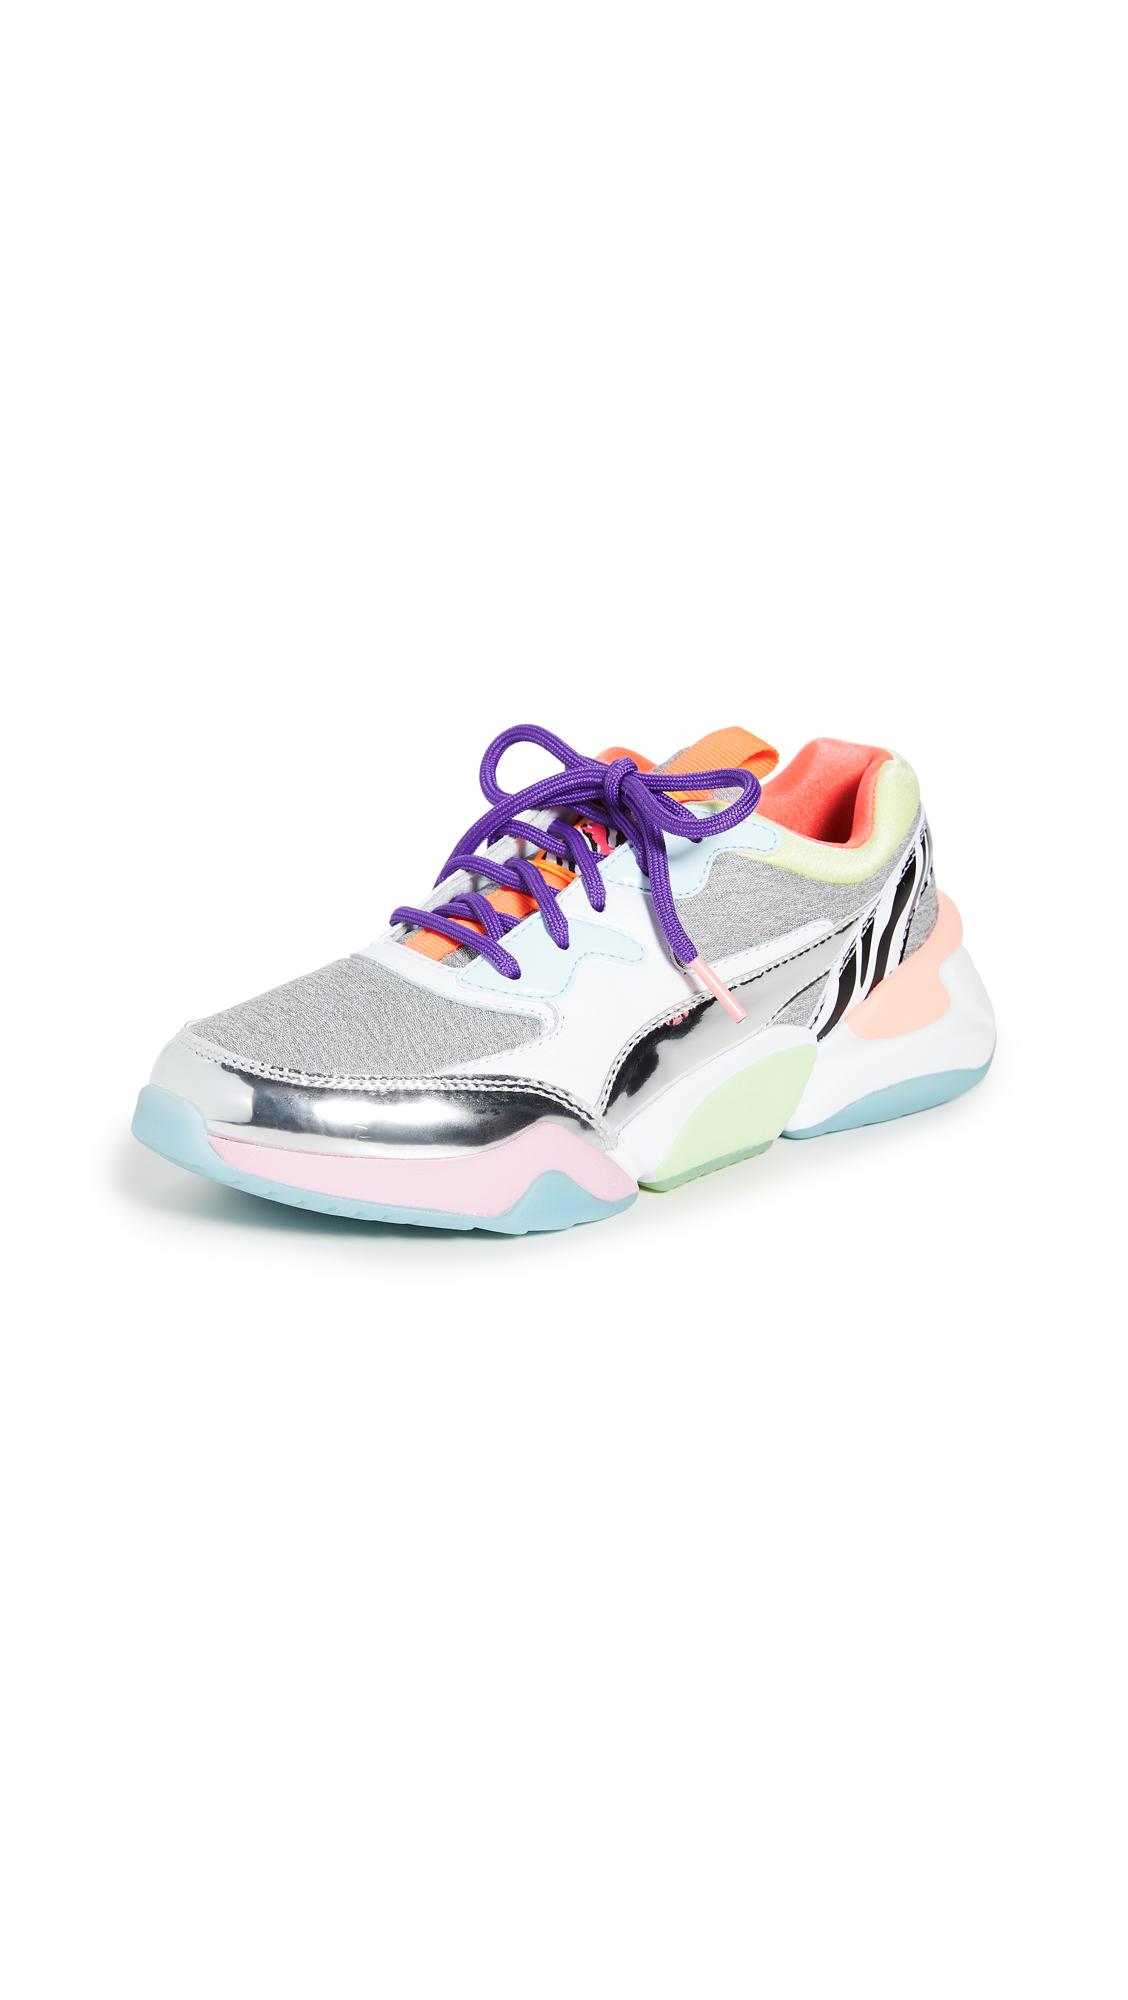 PUMA Nova Sophia Webster Sneakers